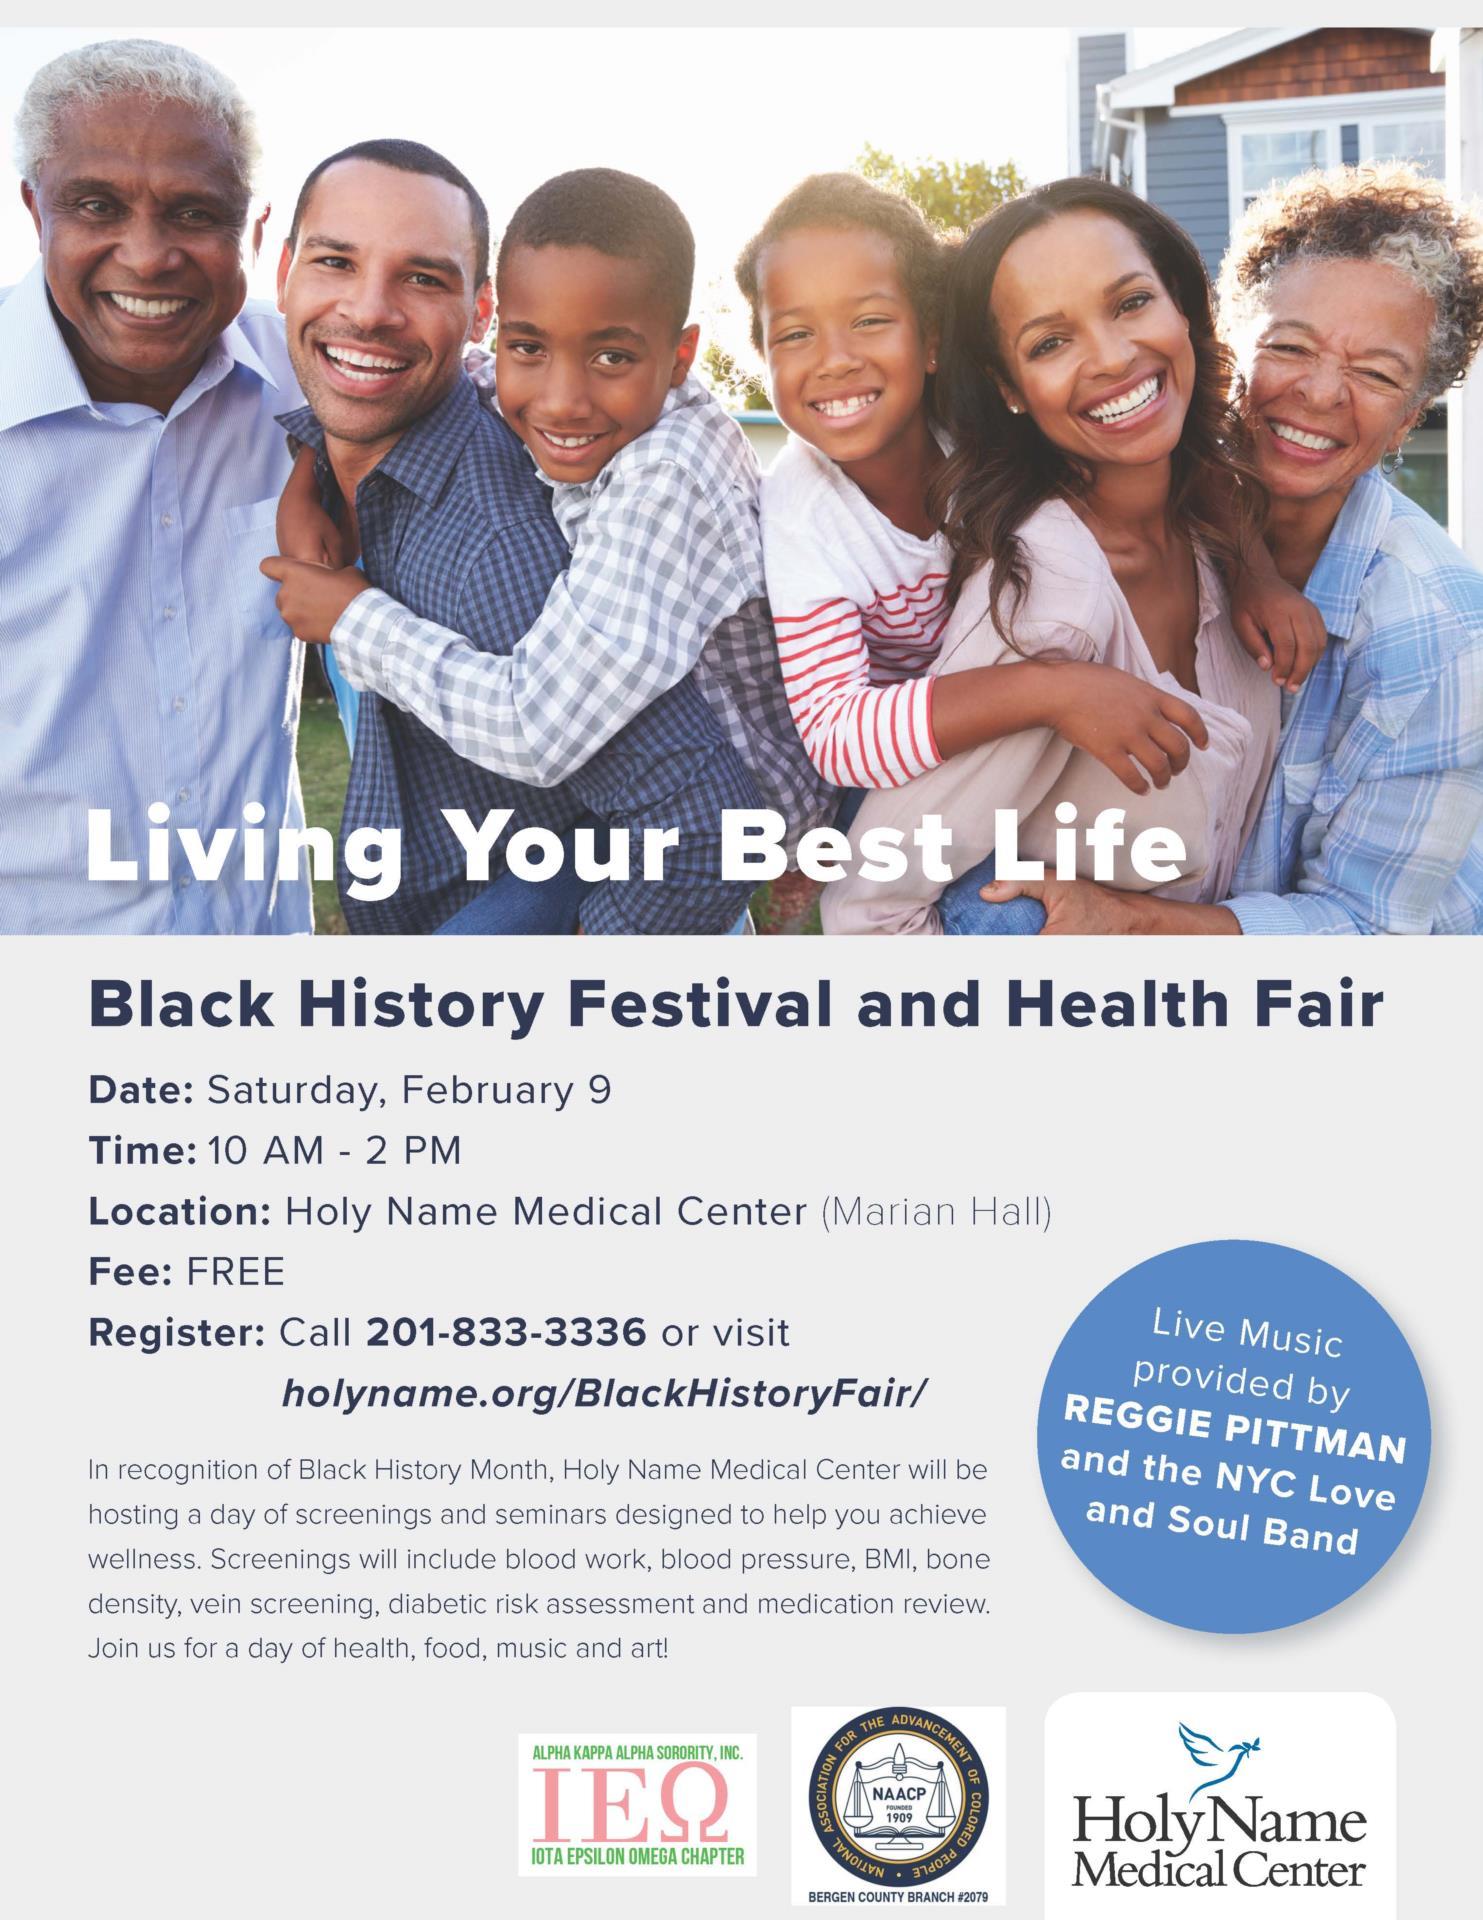 black-history-festival-health-fair